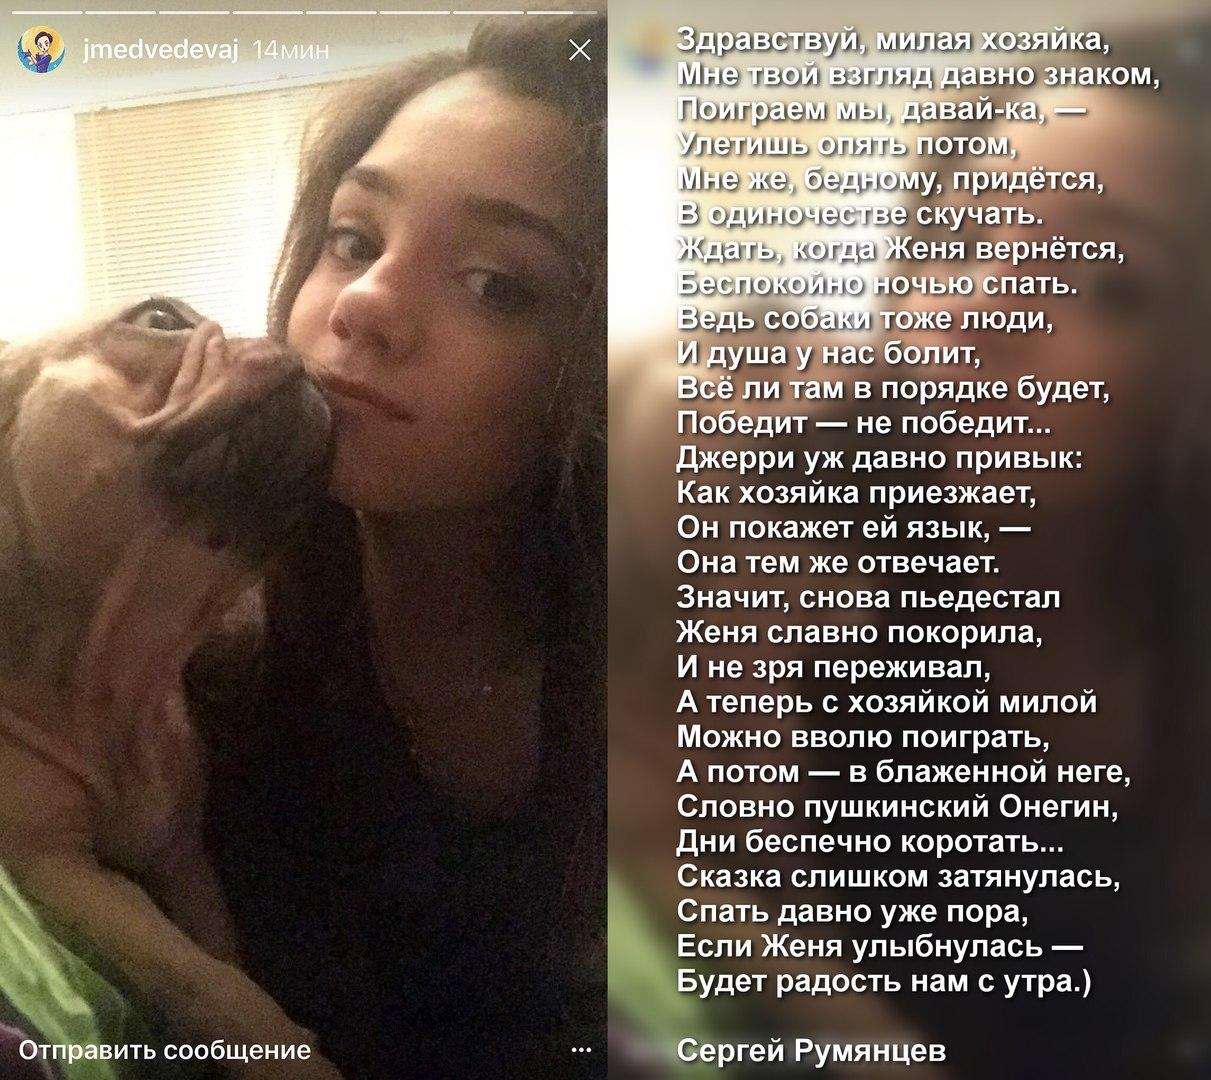 Евгения Медведева - 2 - Страница 50 D5TAUzUVOuw